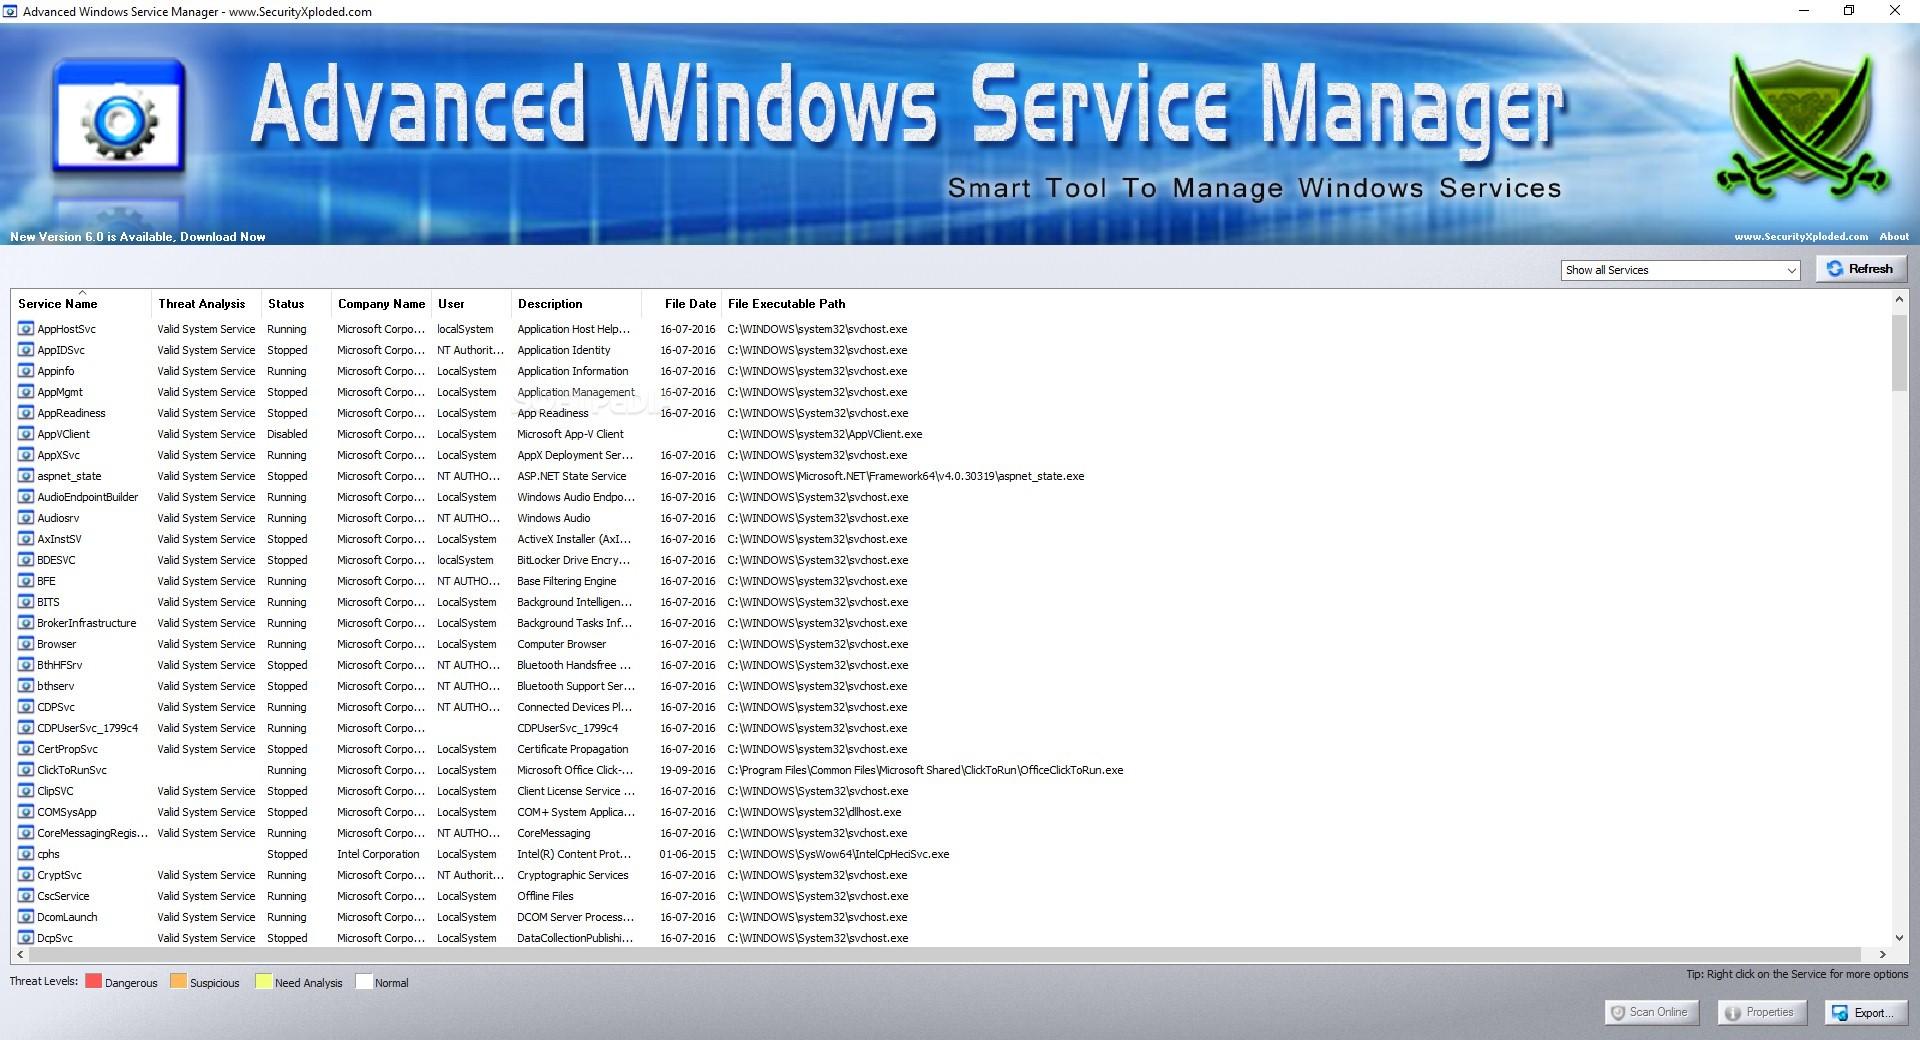 Advanced Windows Service Manager